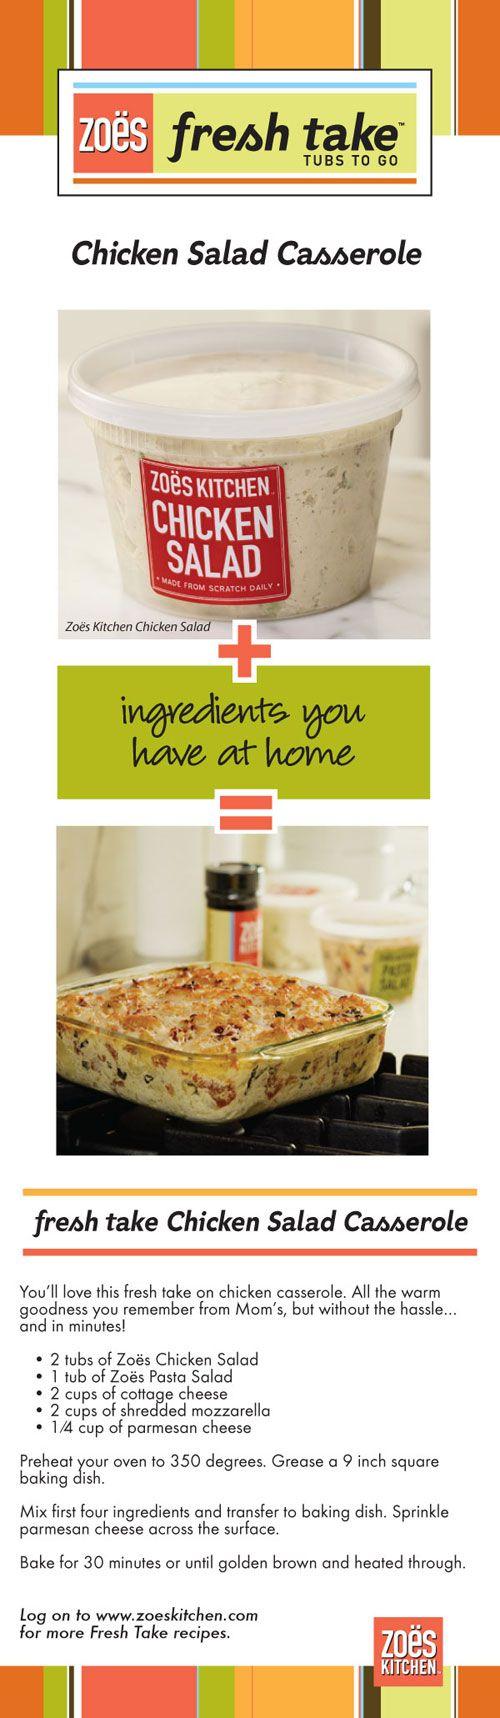 17 best images about zoe's kitchen copycat recipes on pinterest